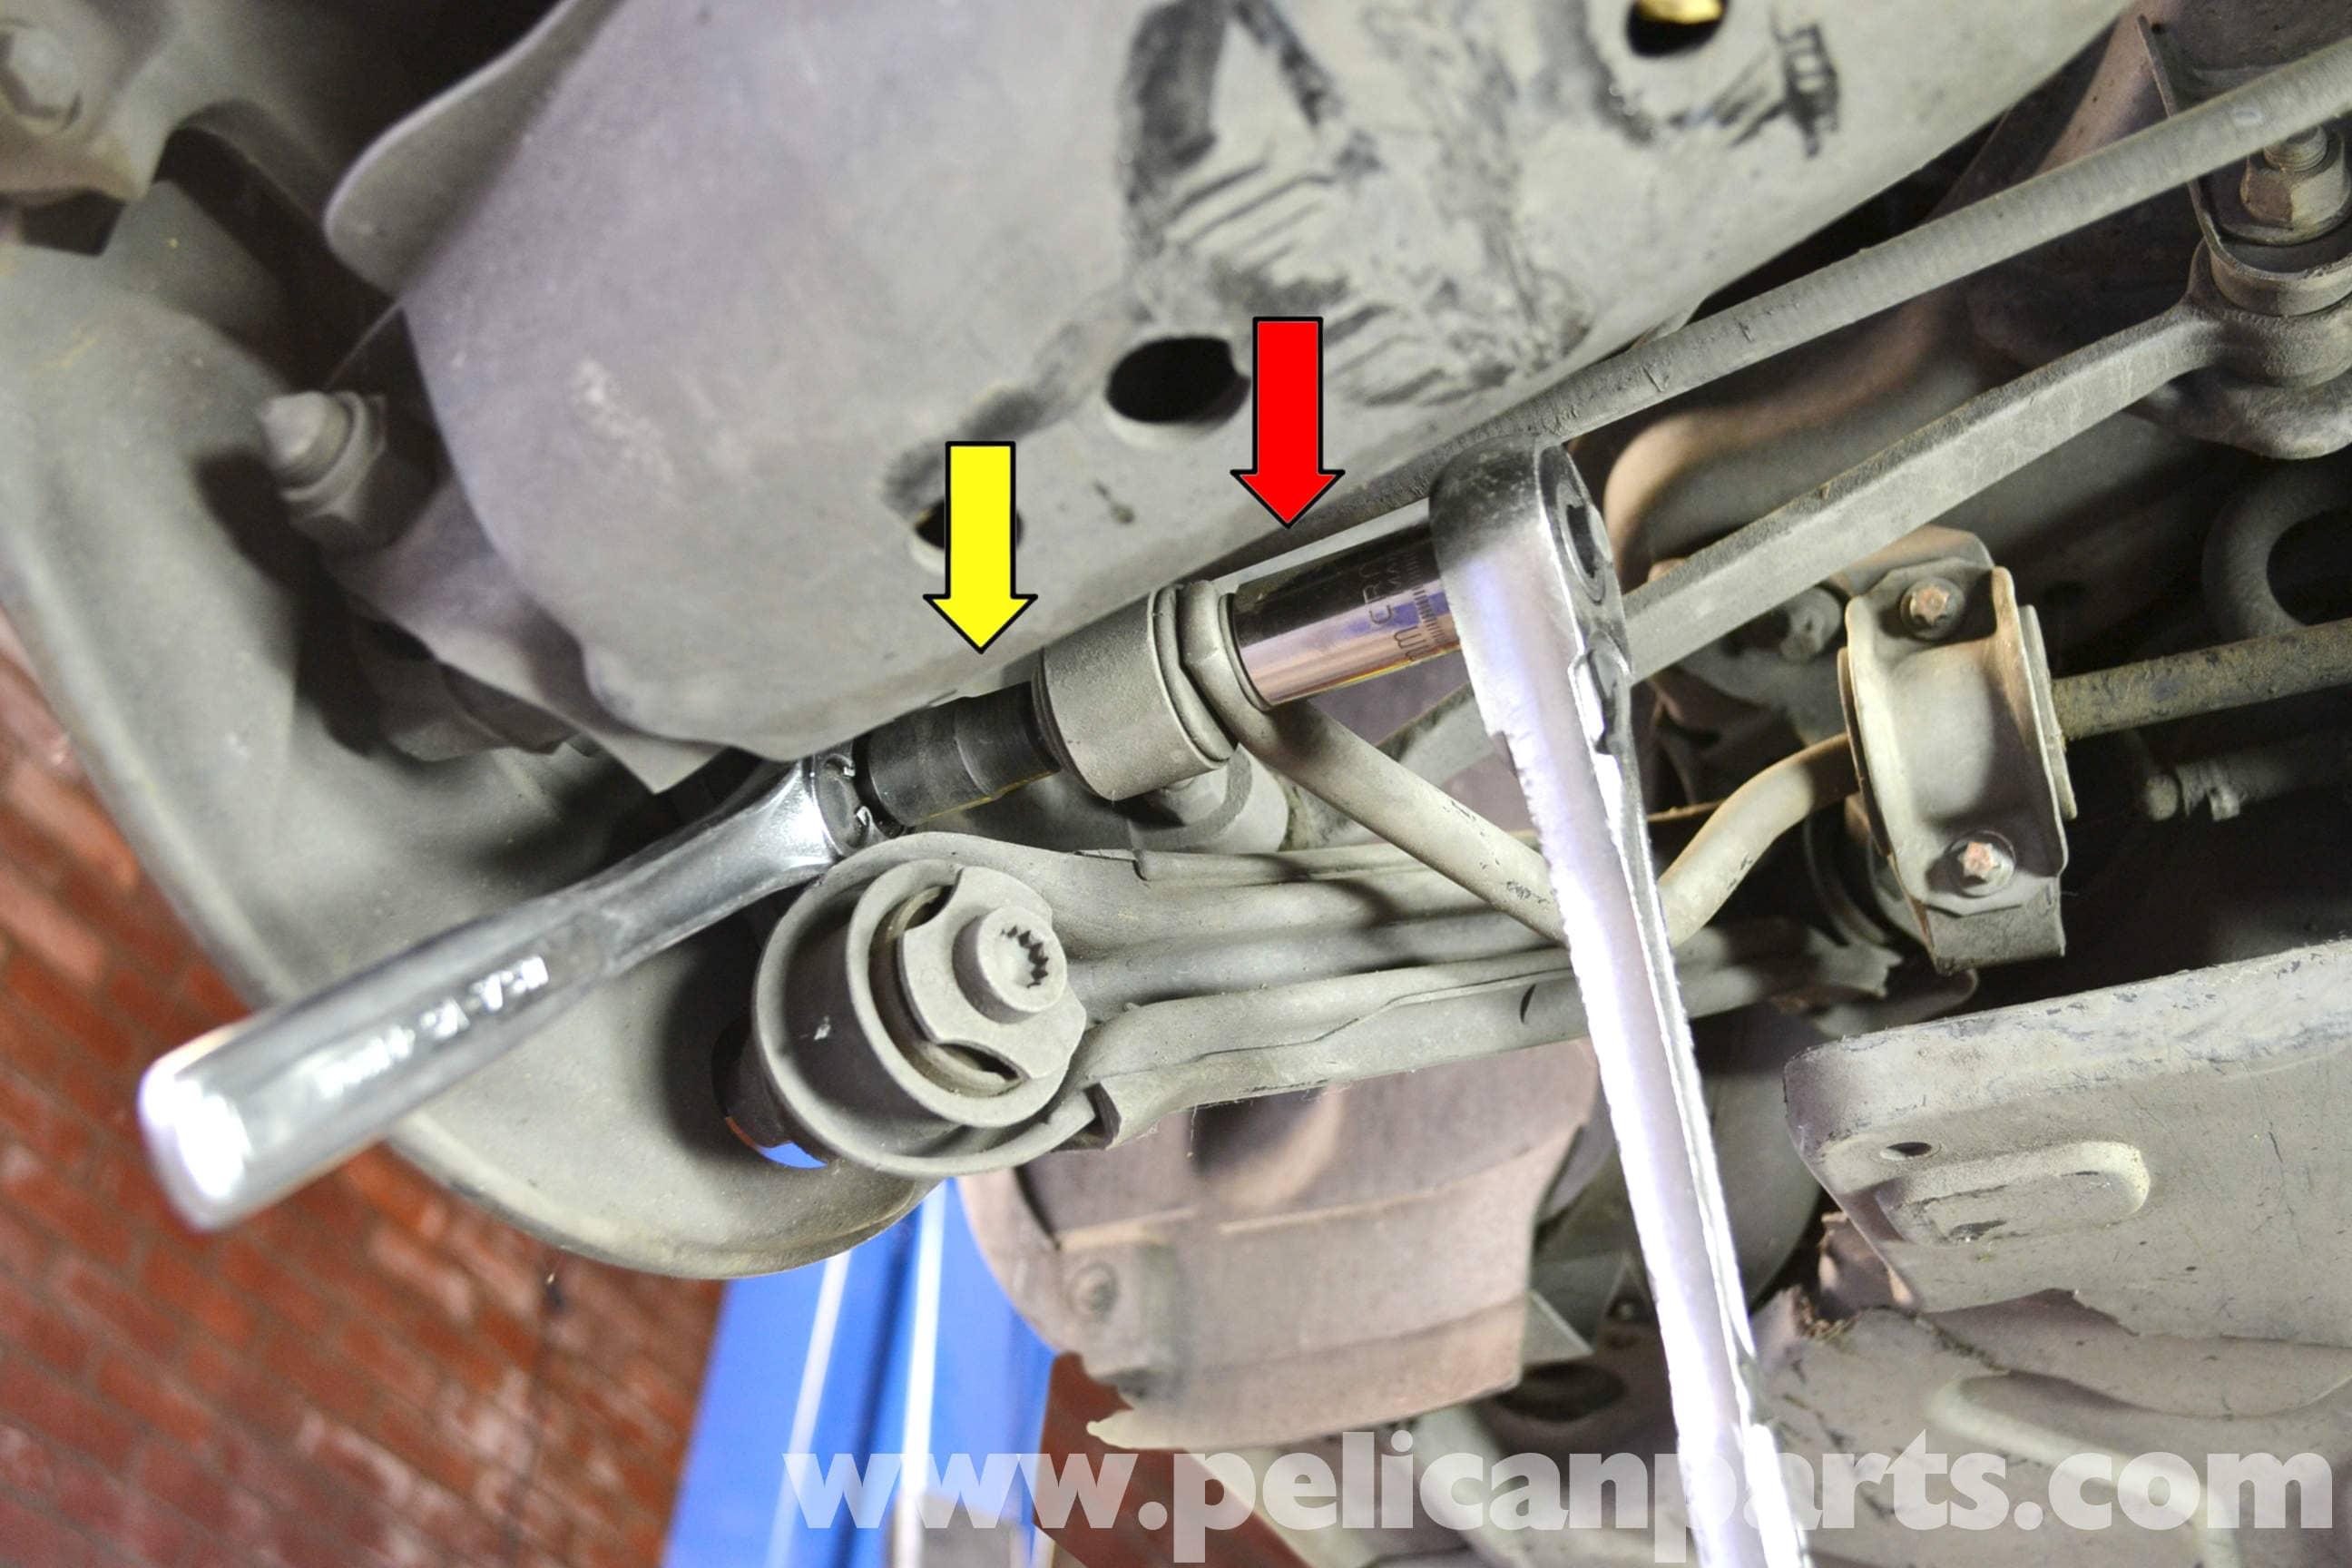 Mercedes Benz W203 Rear Sway Bar Bushing Replacement